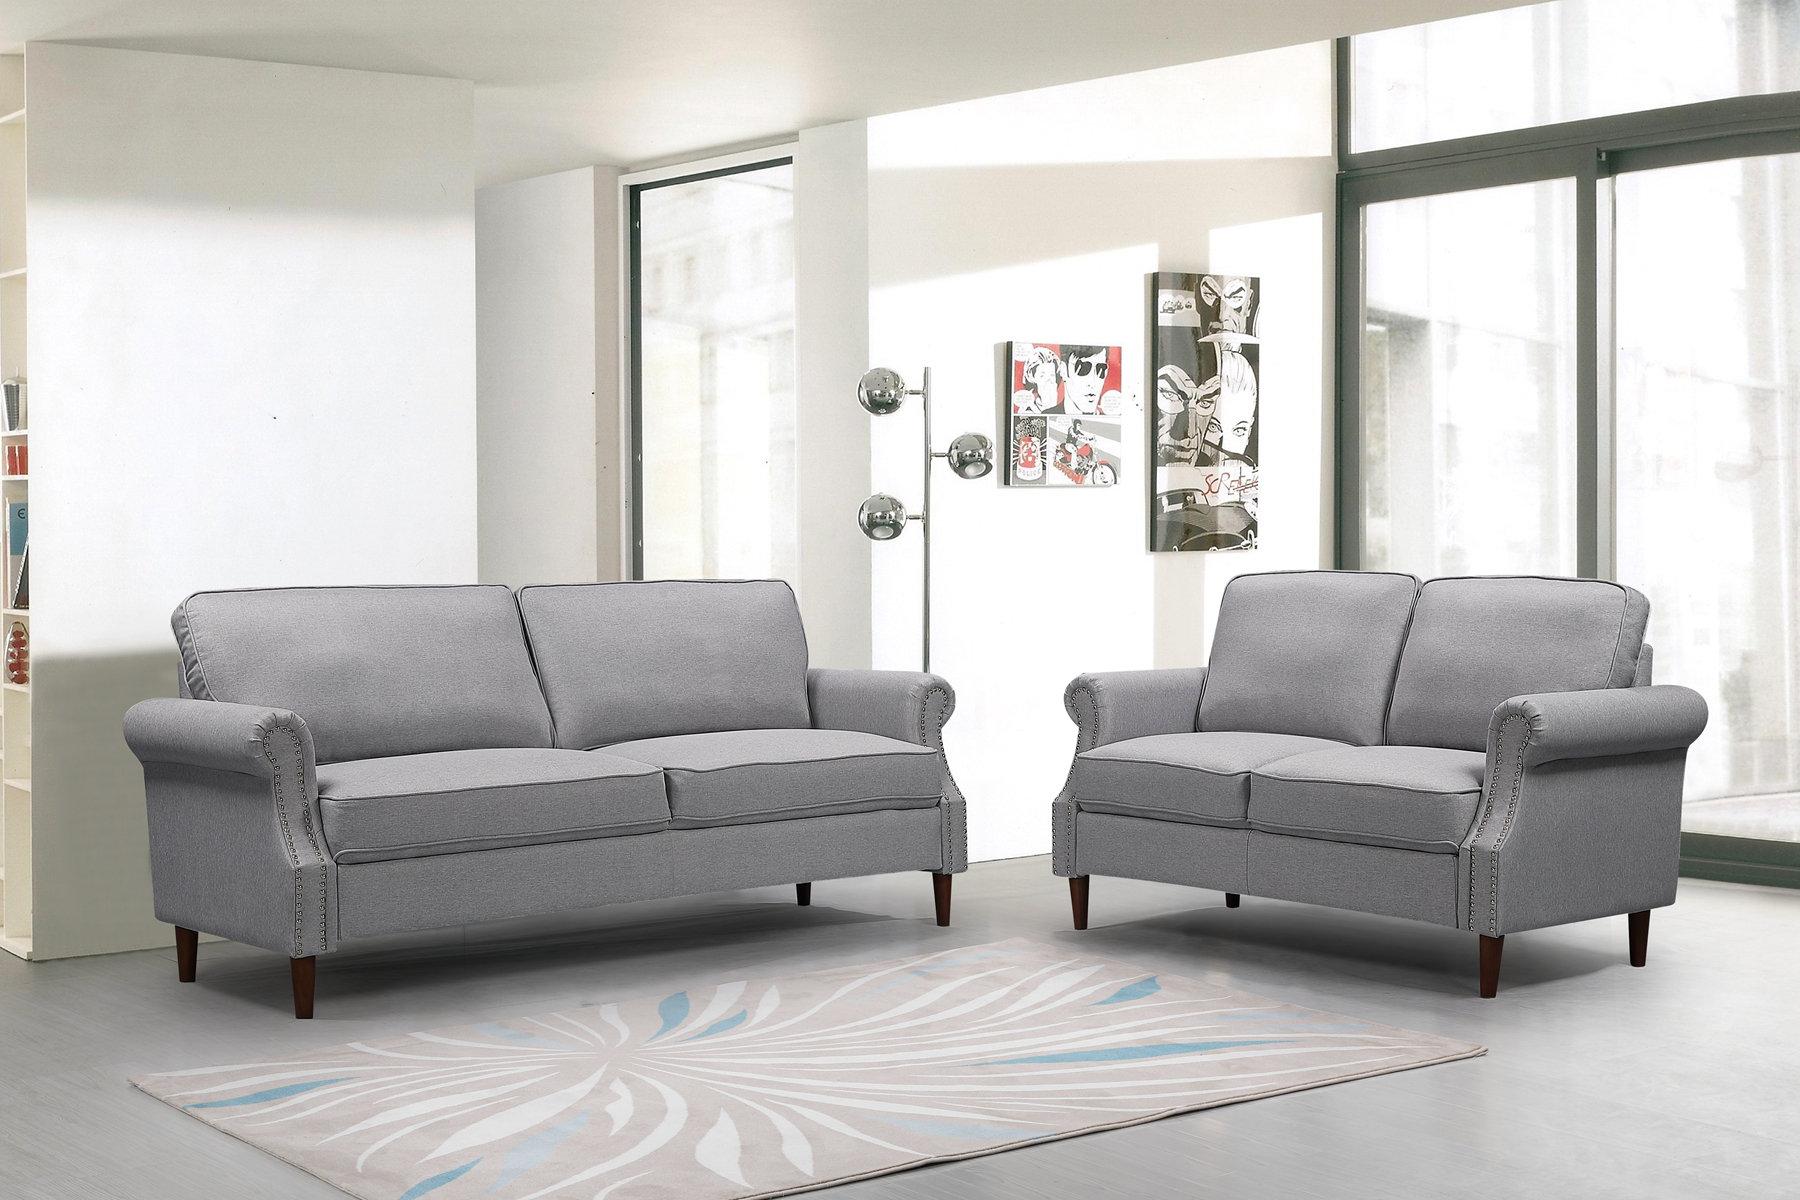 Picture of: Red Barrel Studio 2p 3p Living Room Light Gray Sofa Wayfair